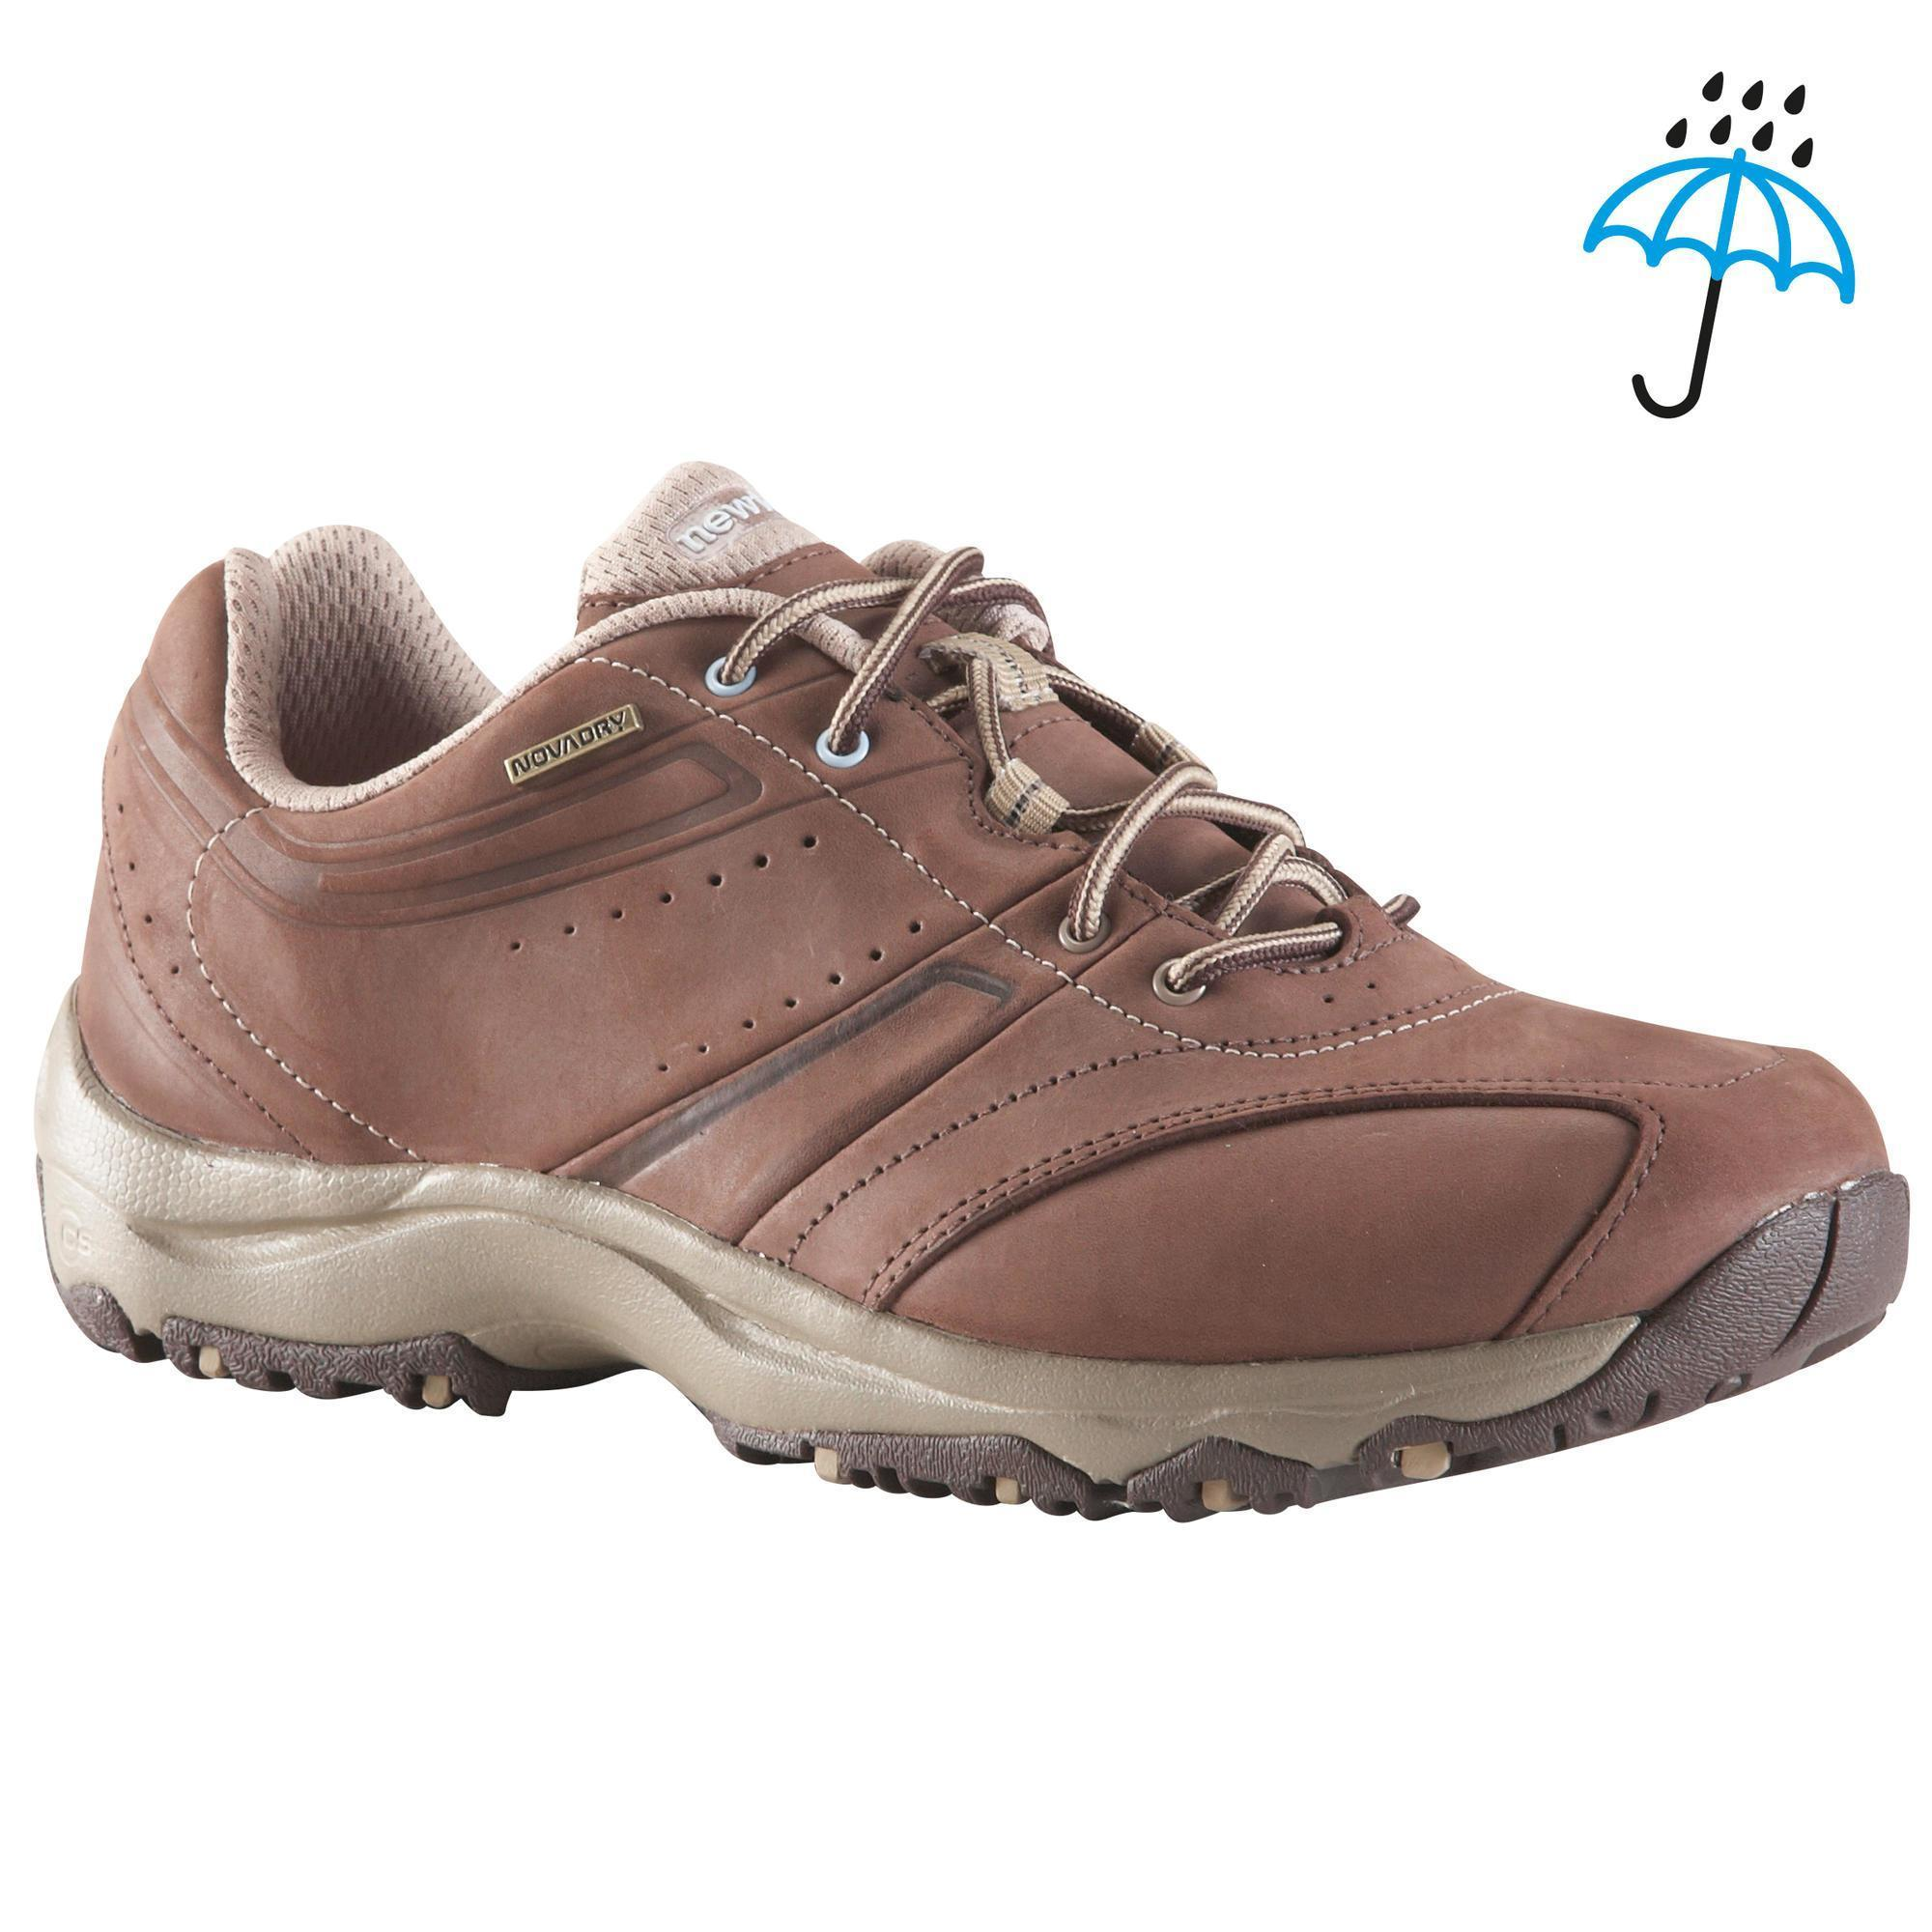 Chaussures Marche Sportive Femme Nakuru Impermeable Cuir Marron